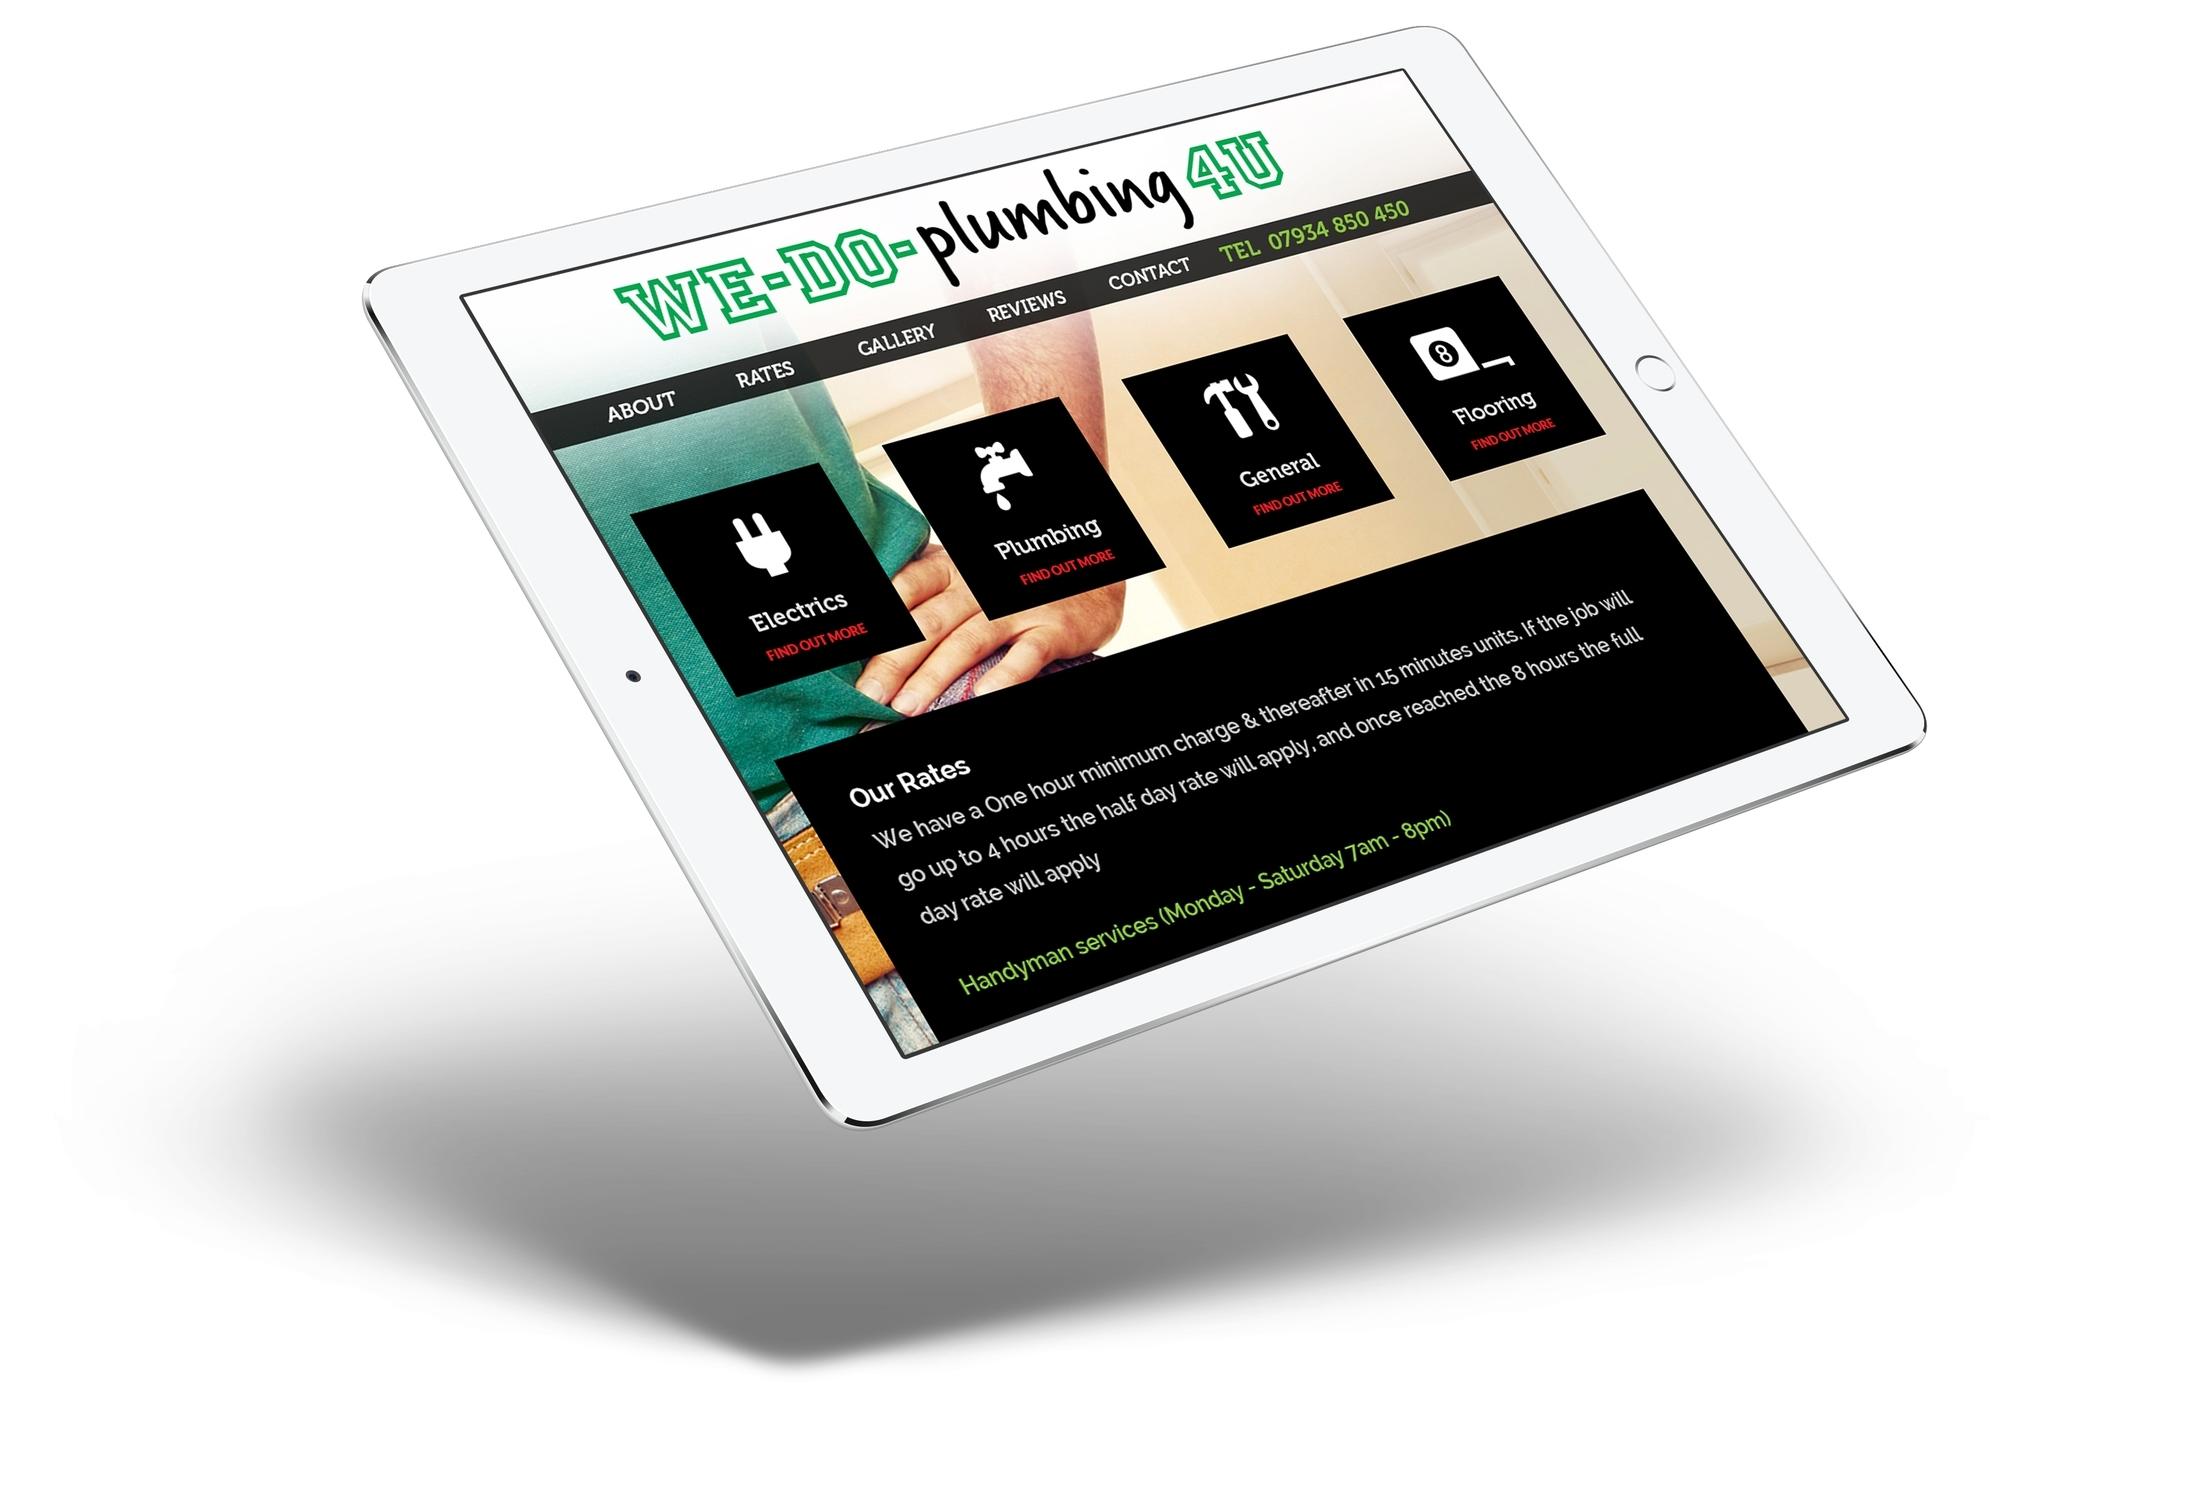 002-iPad-Landscape we-do-4u.jpg